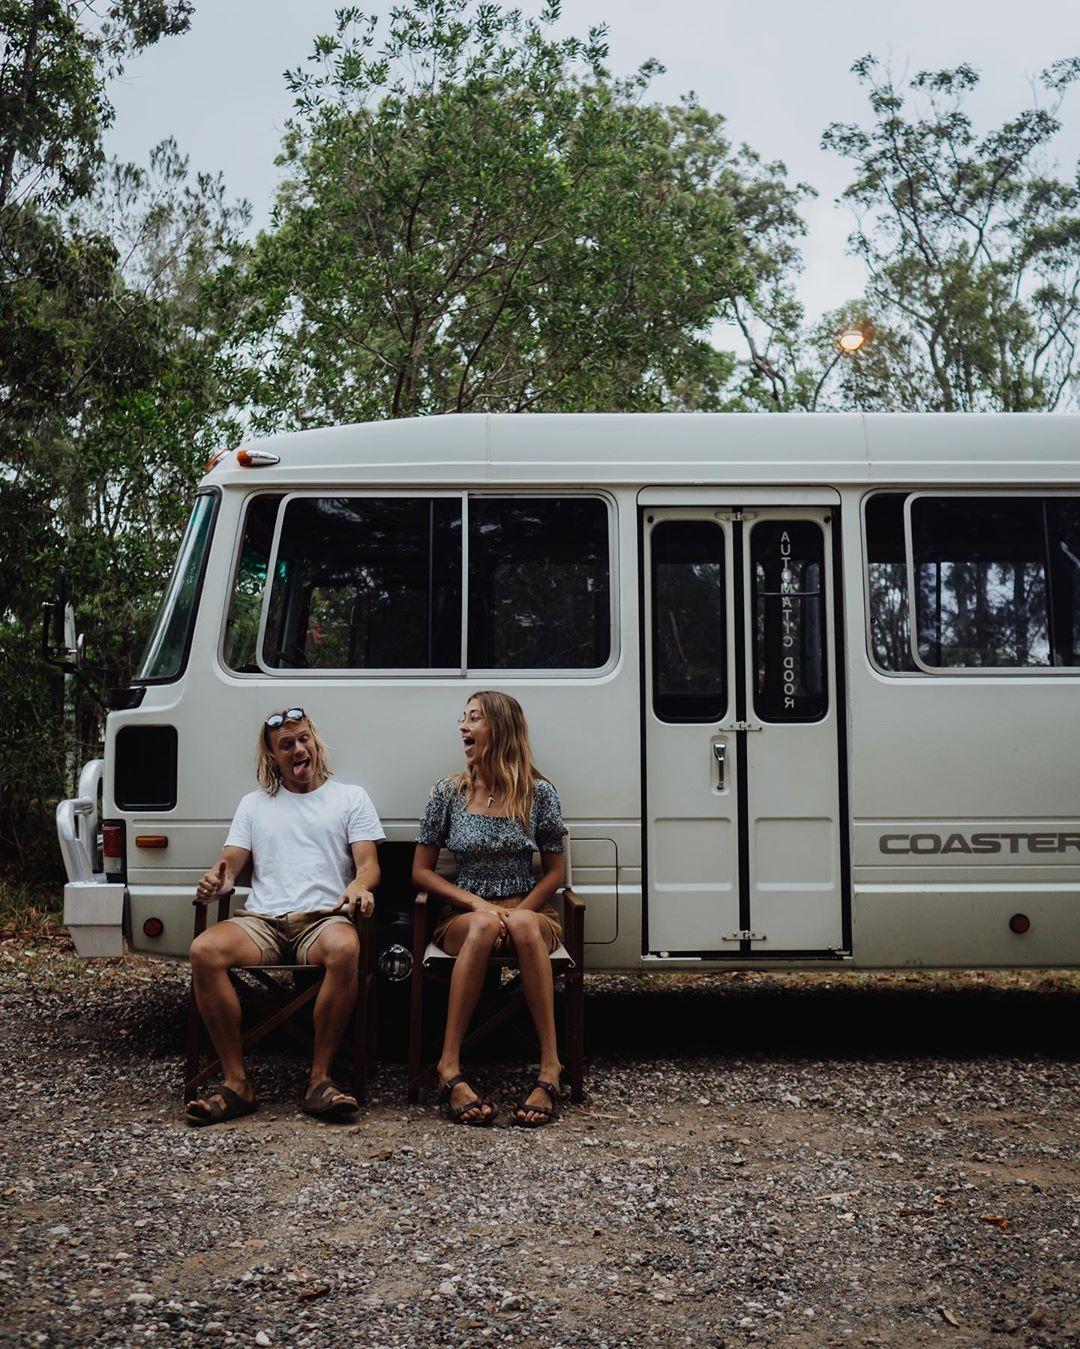 E l i s e on instagram sooo we brought a bus